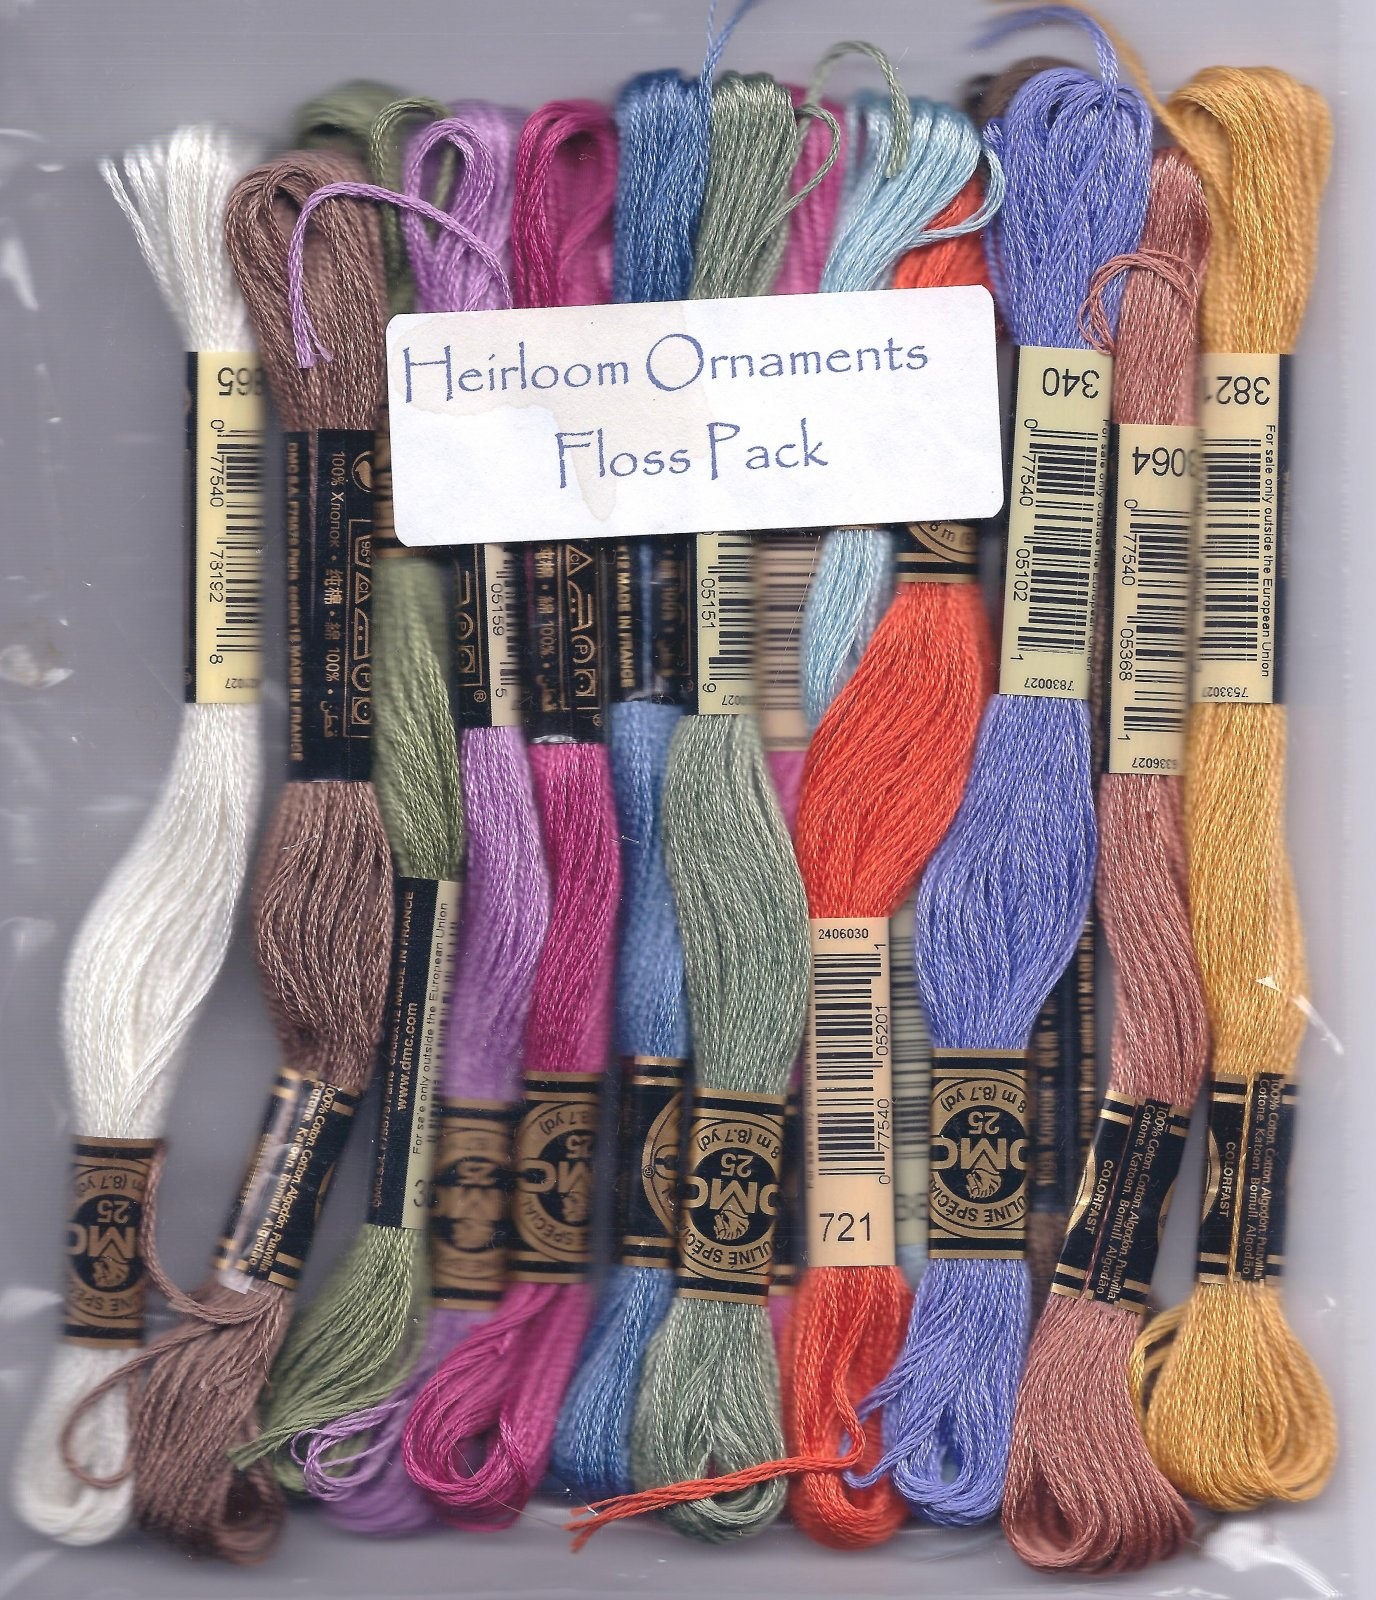 FPHO Heirloom Ornaments Floss Pack